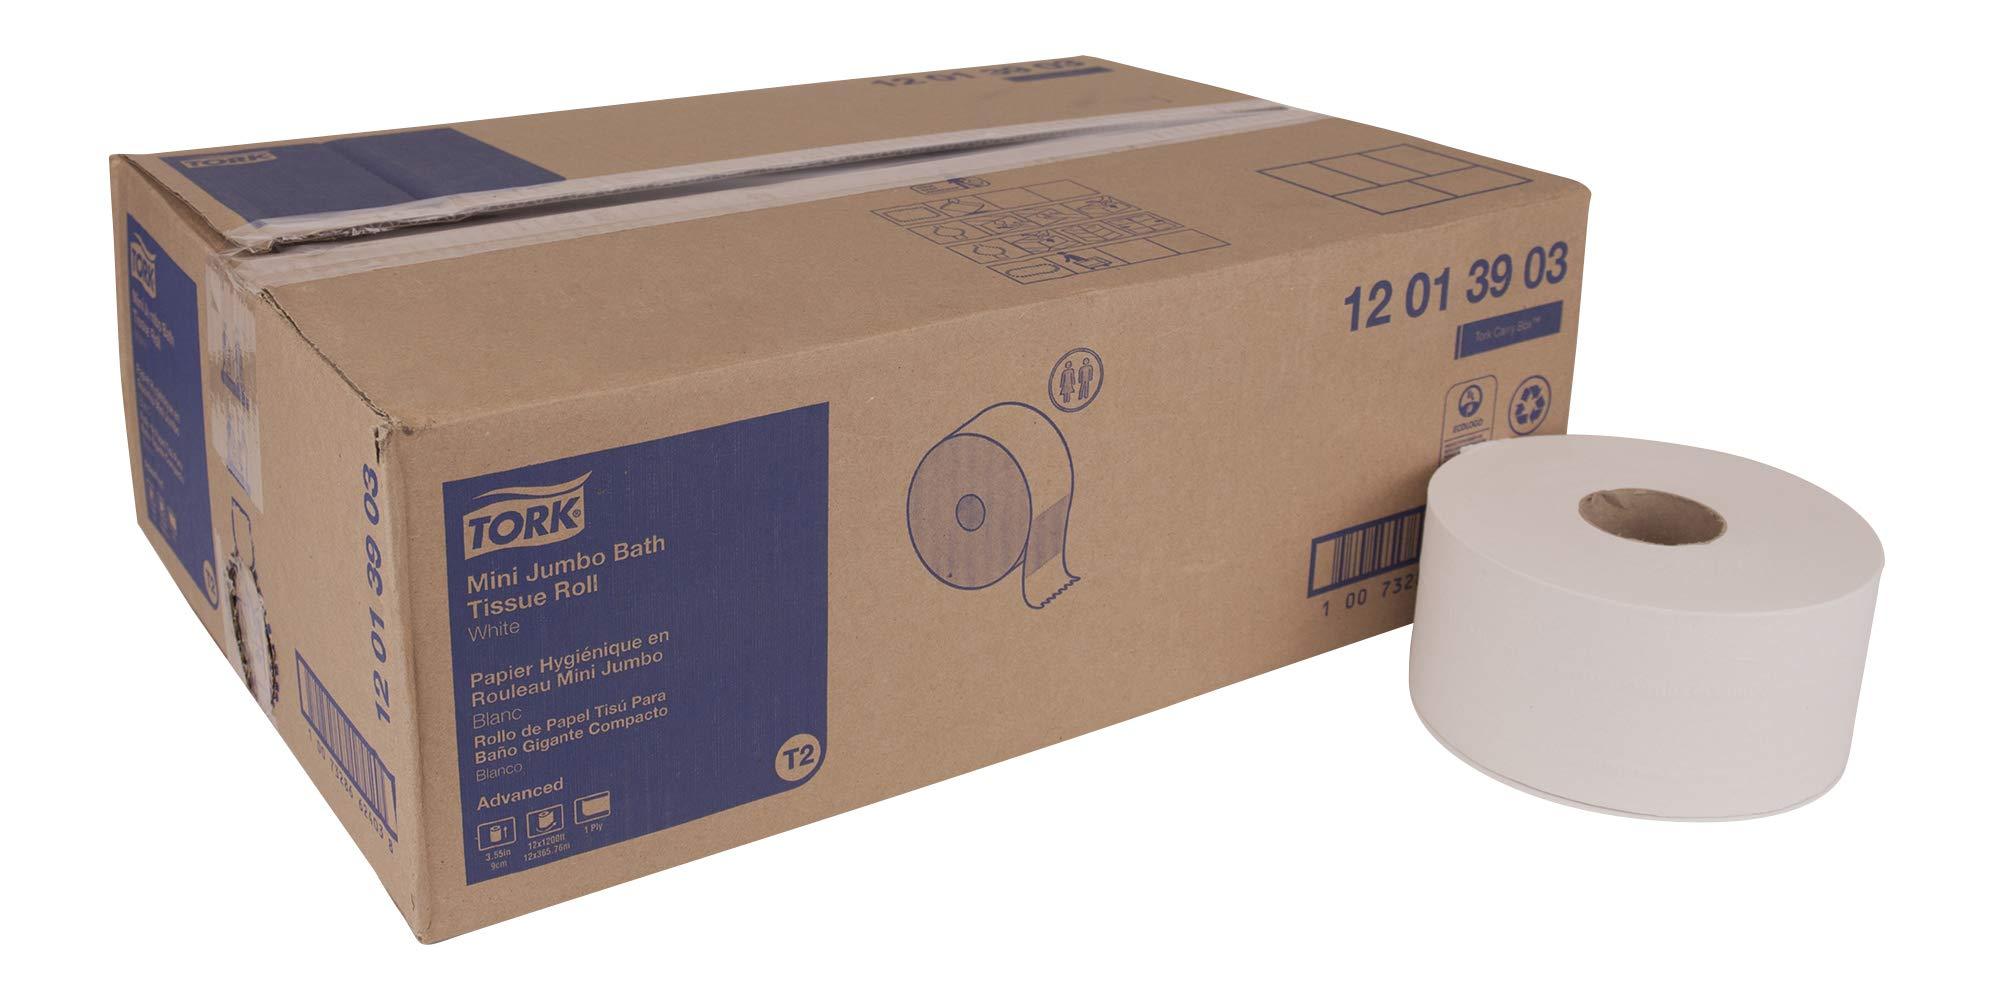 Tork Advanced 12013903 Mini Jumbo Bath Tissue Roll, 1-Ply, 7.36'' Diameter, 3.55'' Width x 1,200' Length, White (Case of 12 Rolls, 1,200' per Roll, 14,400 Feet) by Tork